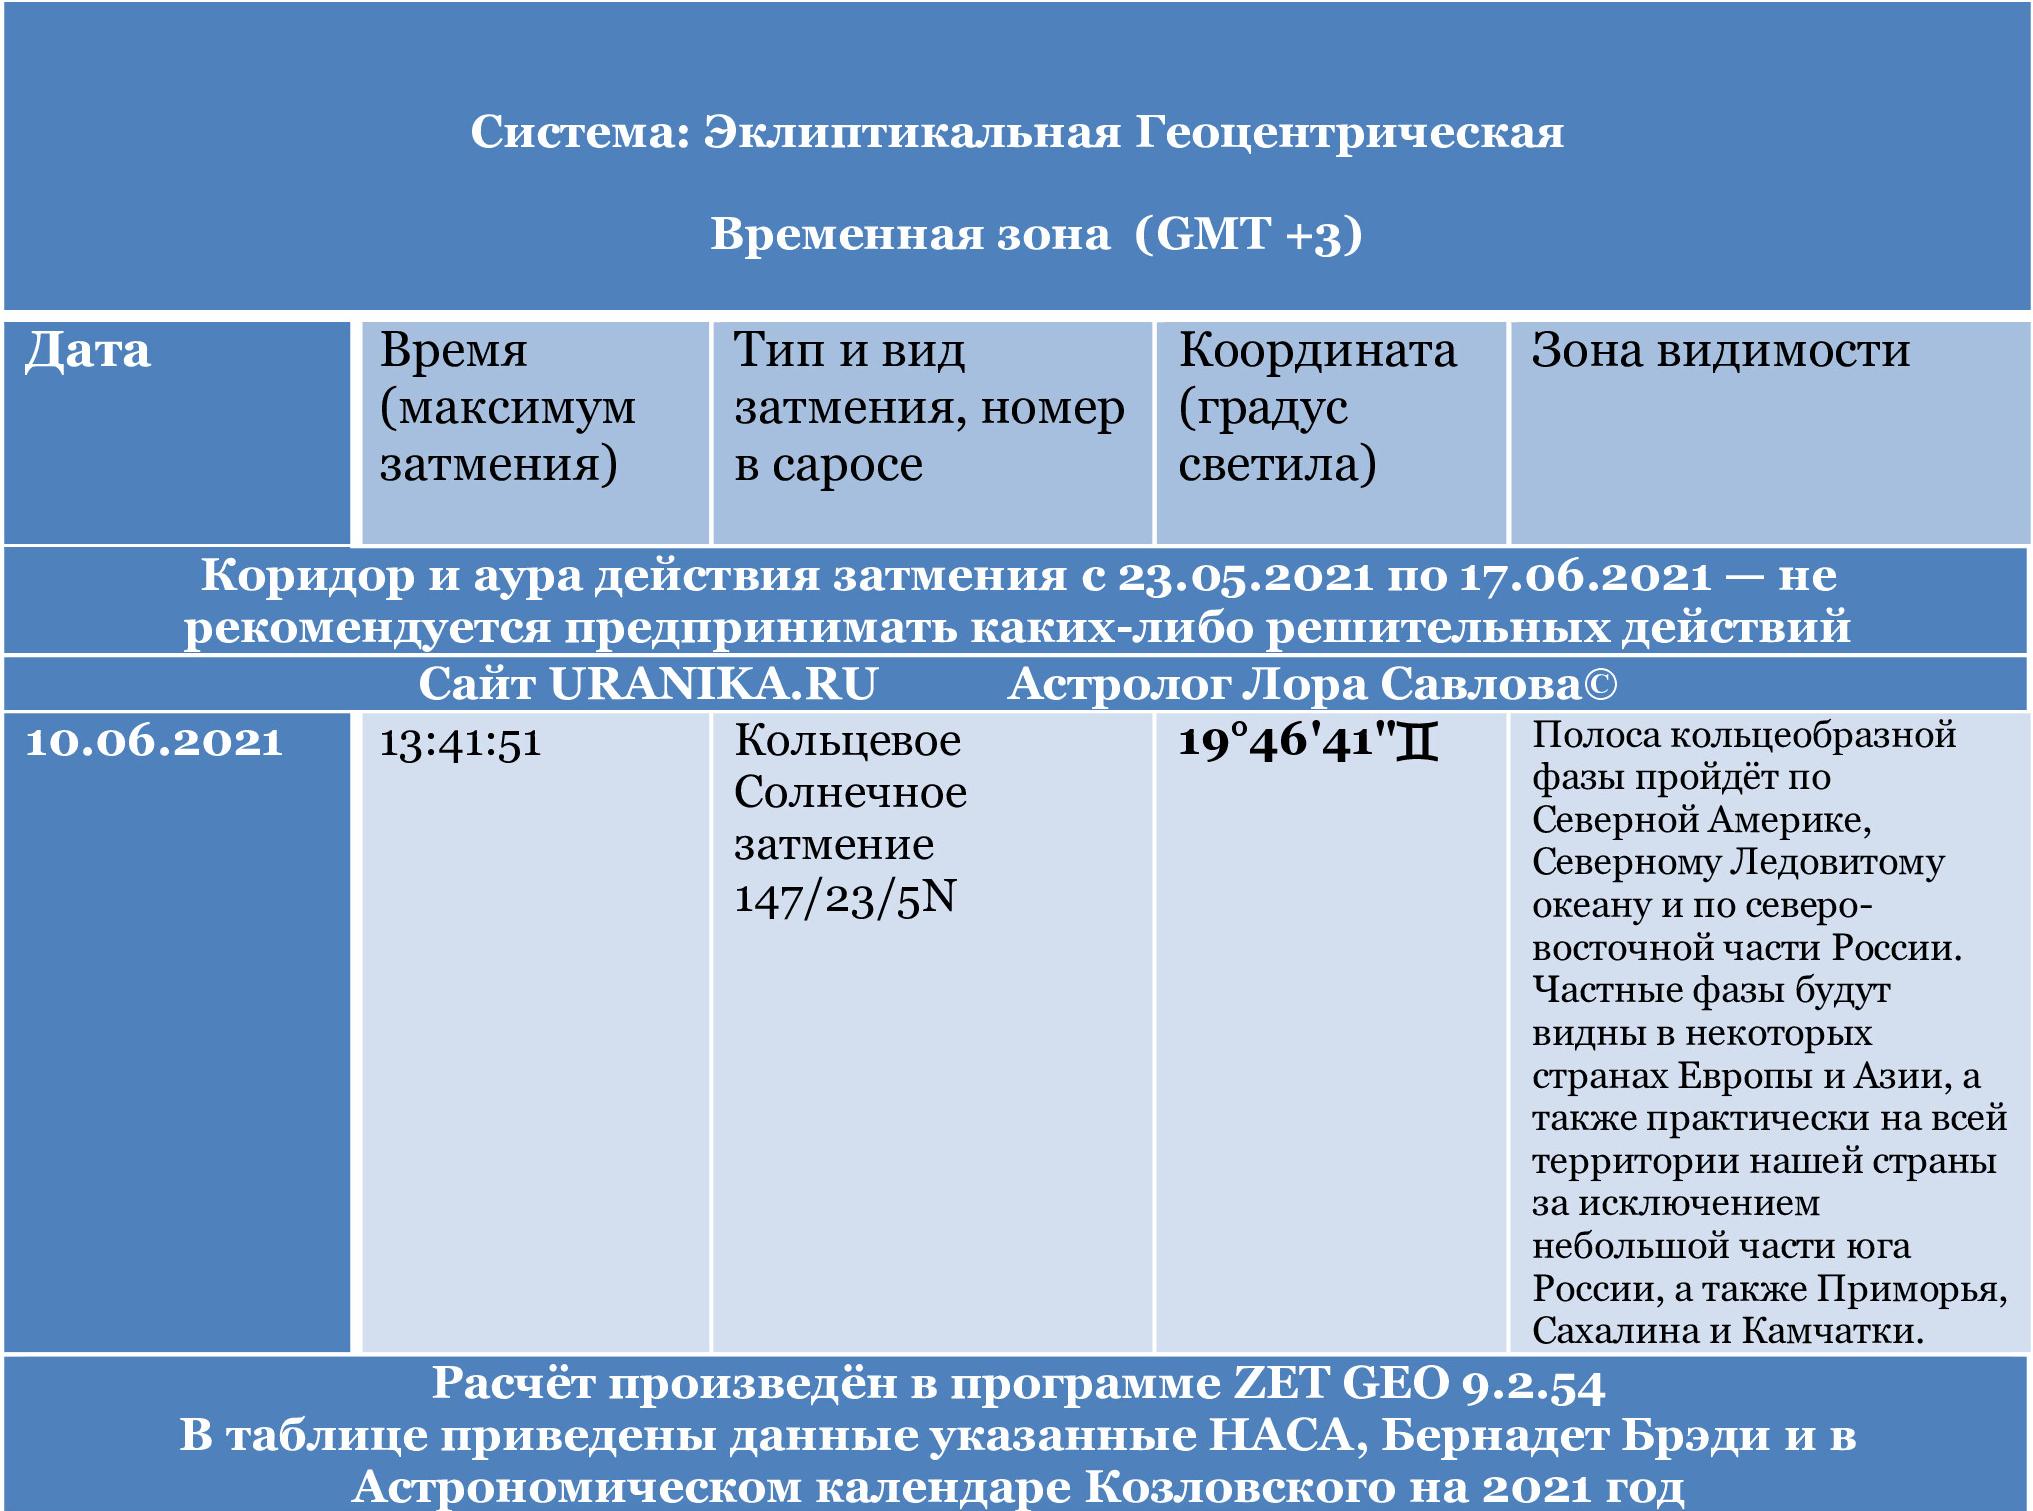 solnechnoe kolcevoe zatmenie 10 ijunja 2021 goda - Солнечное затмение 10 июня 2021 года